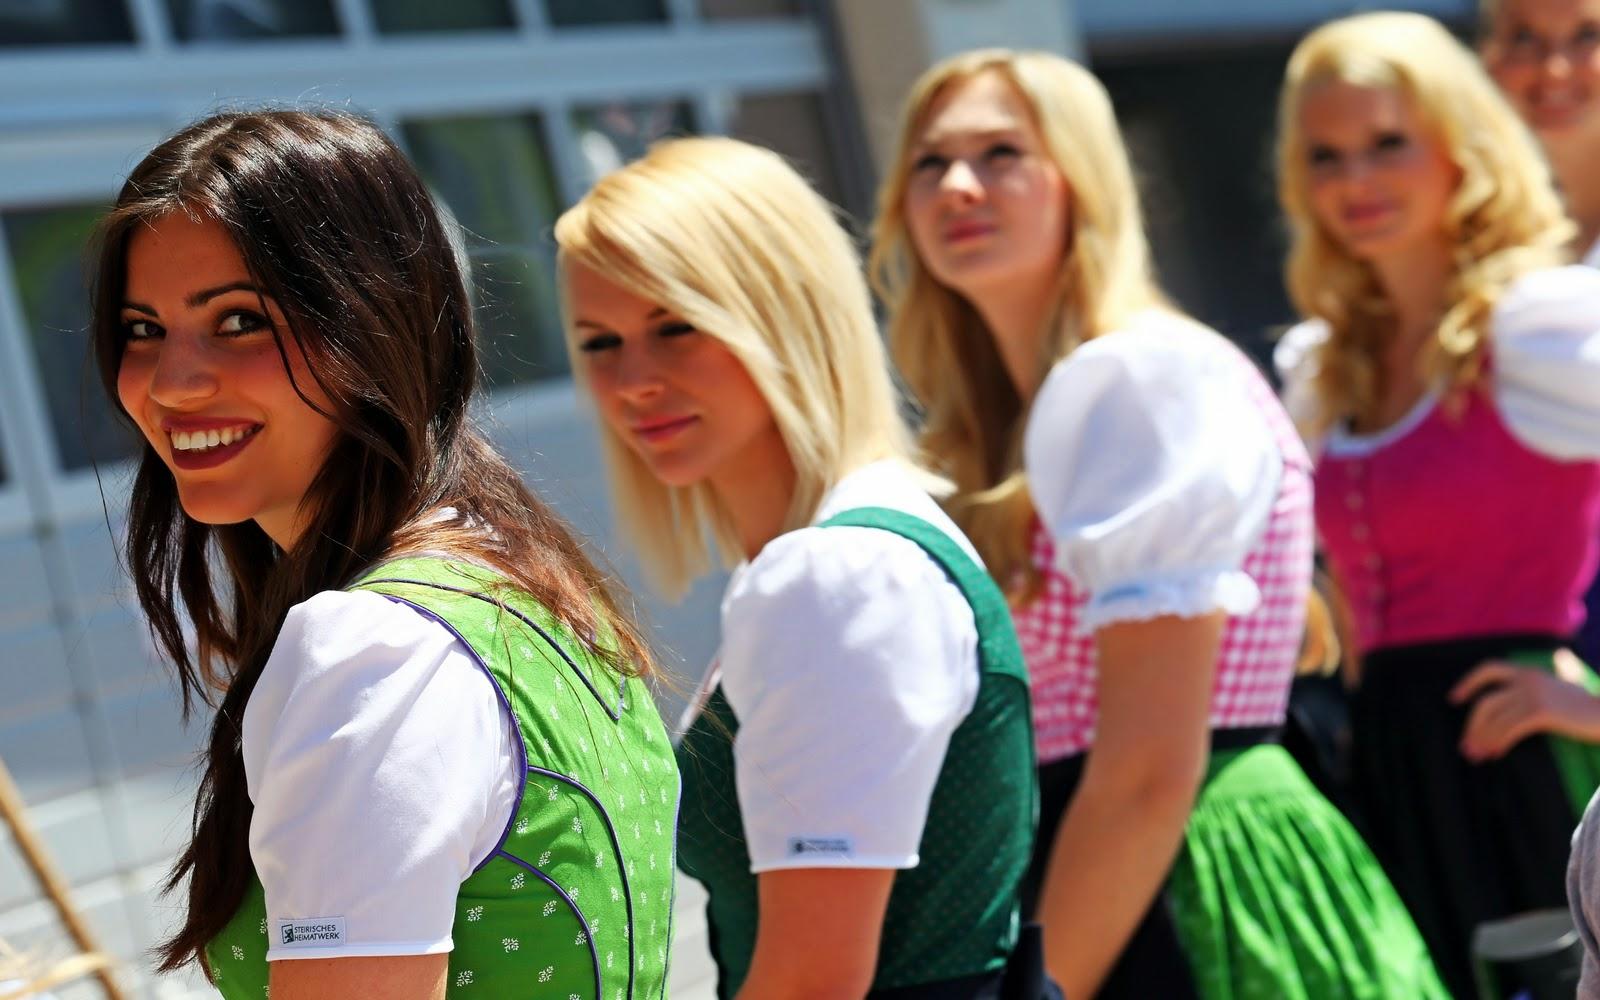 Hot teens of austria